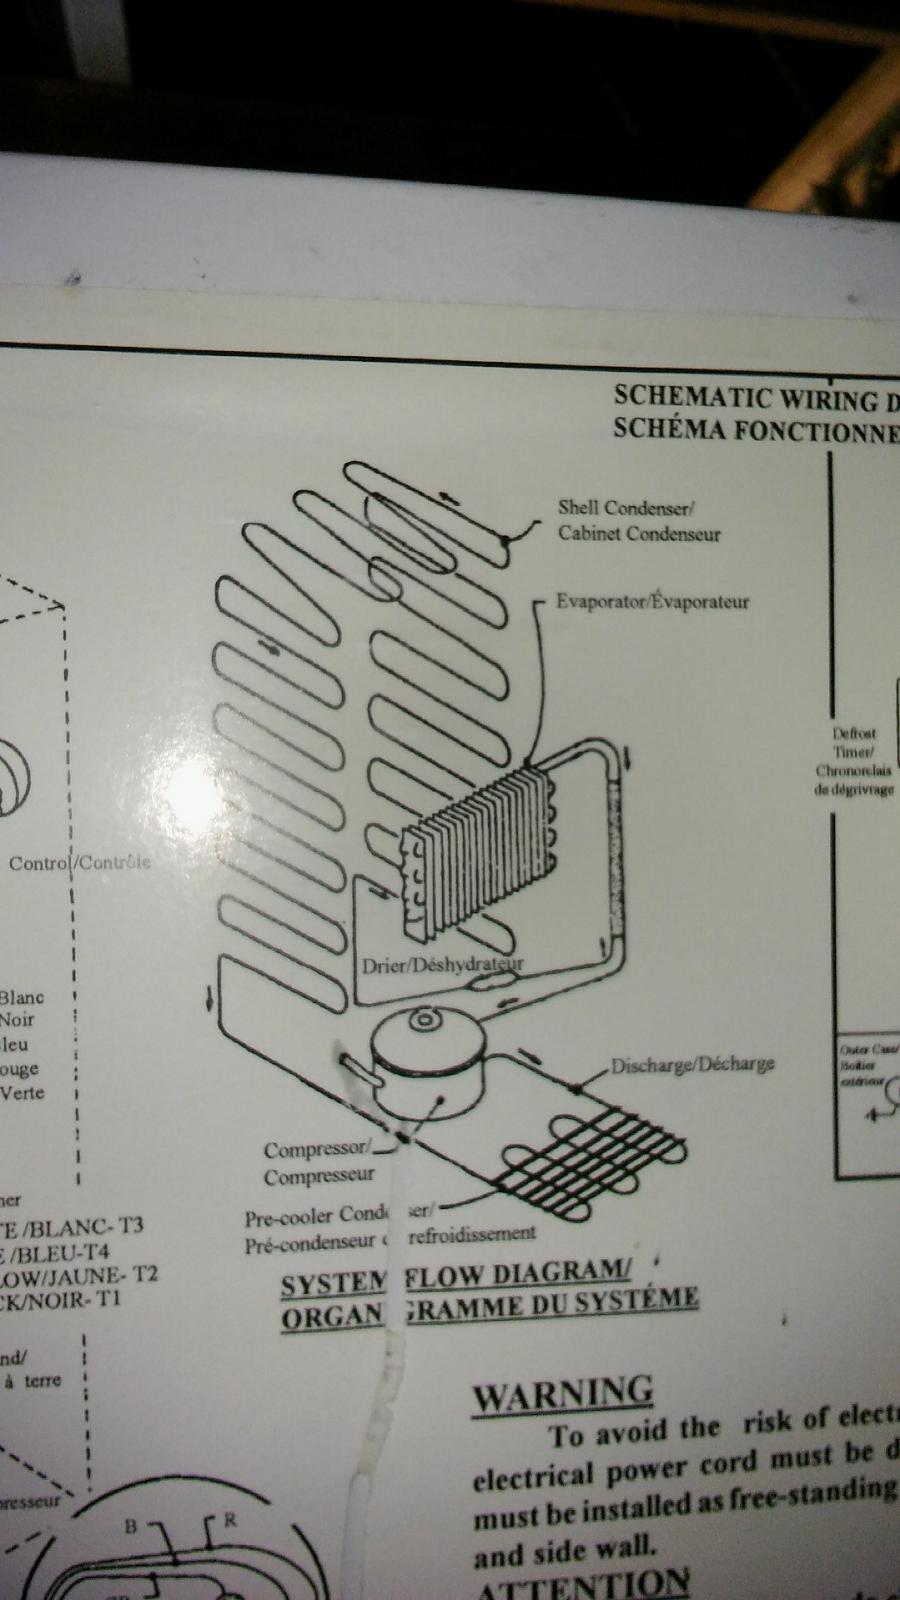 Charming Mf 2135 Alternator Wiring Diagram 1967 Gallery - Best Image ...